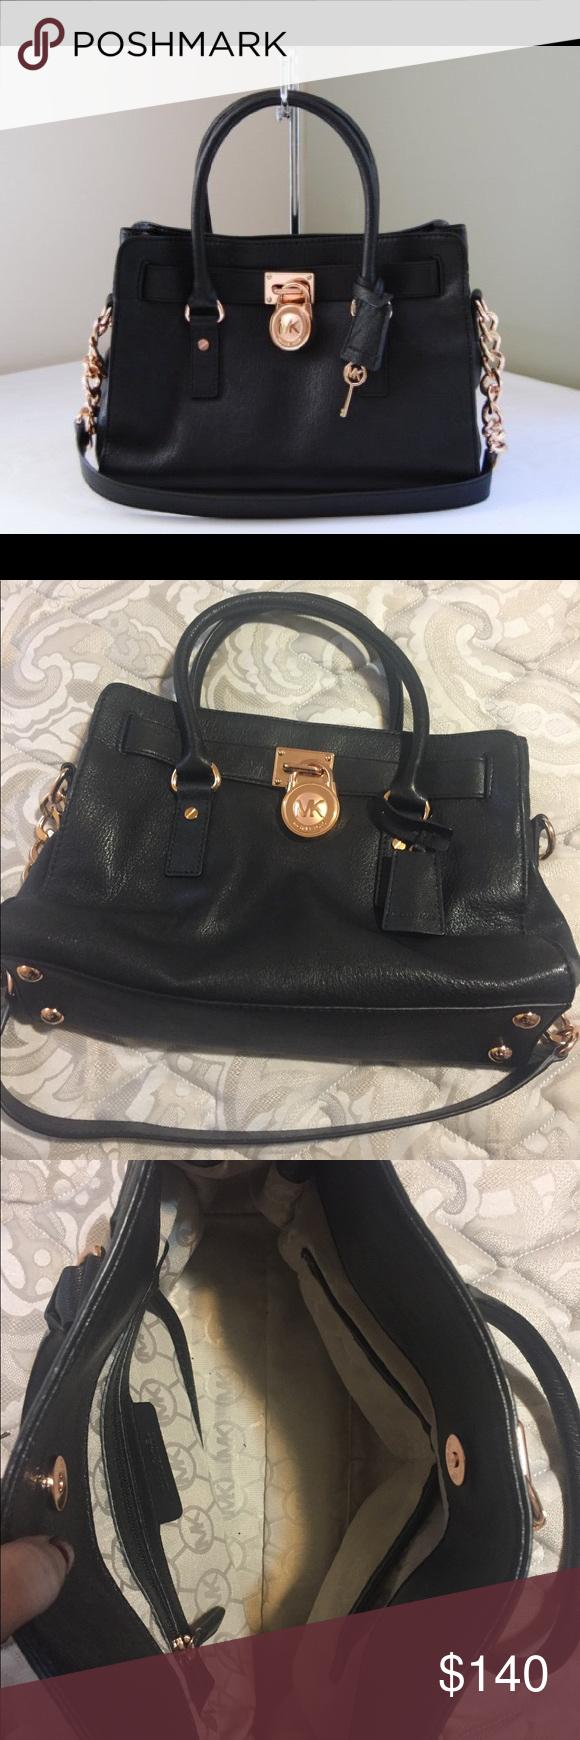 d4c158031e60e7 Michael Kors Black and Rose Gold Hamilton Gorgeous black leather satchel  handbag with rose gold hardware ...